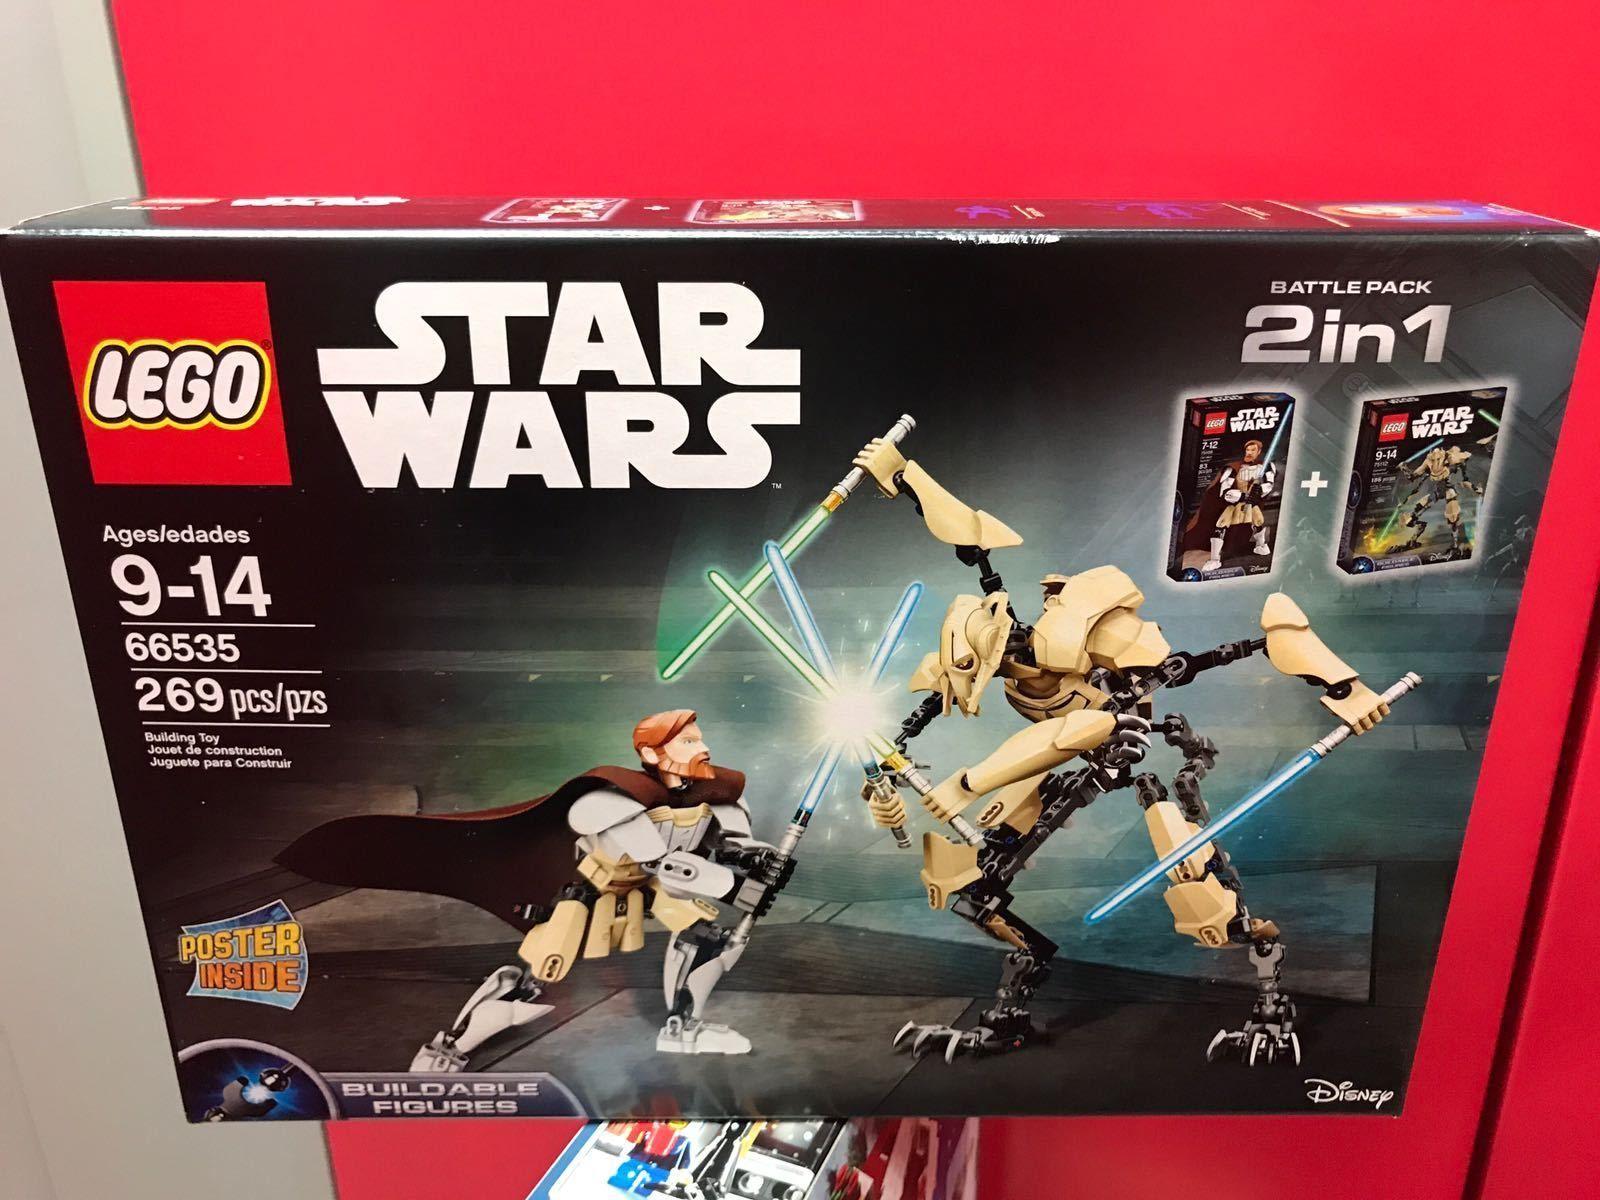 Lego Star Wars 66535 Obi Wan Kenobi General Grievous 2 In 1 75109 75112 Lego Star Wars Star Wars 2 Star Wars